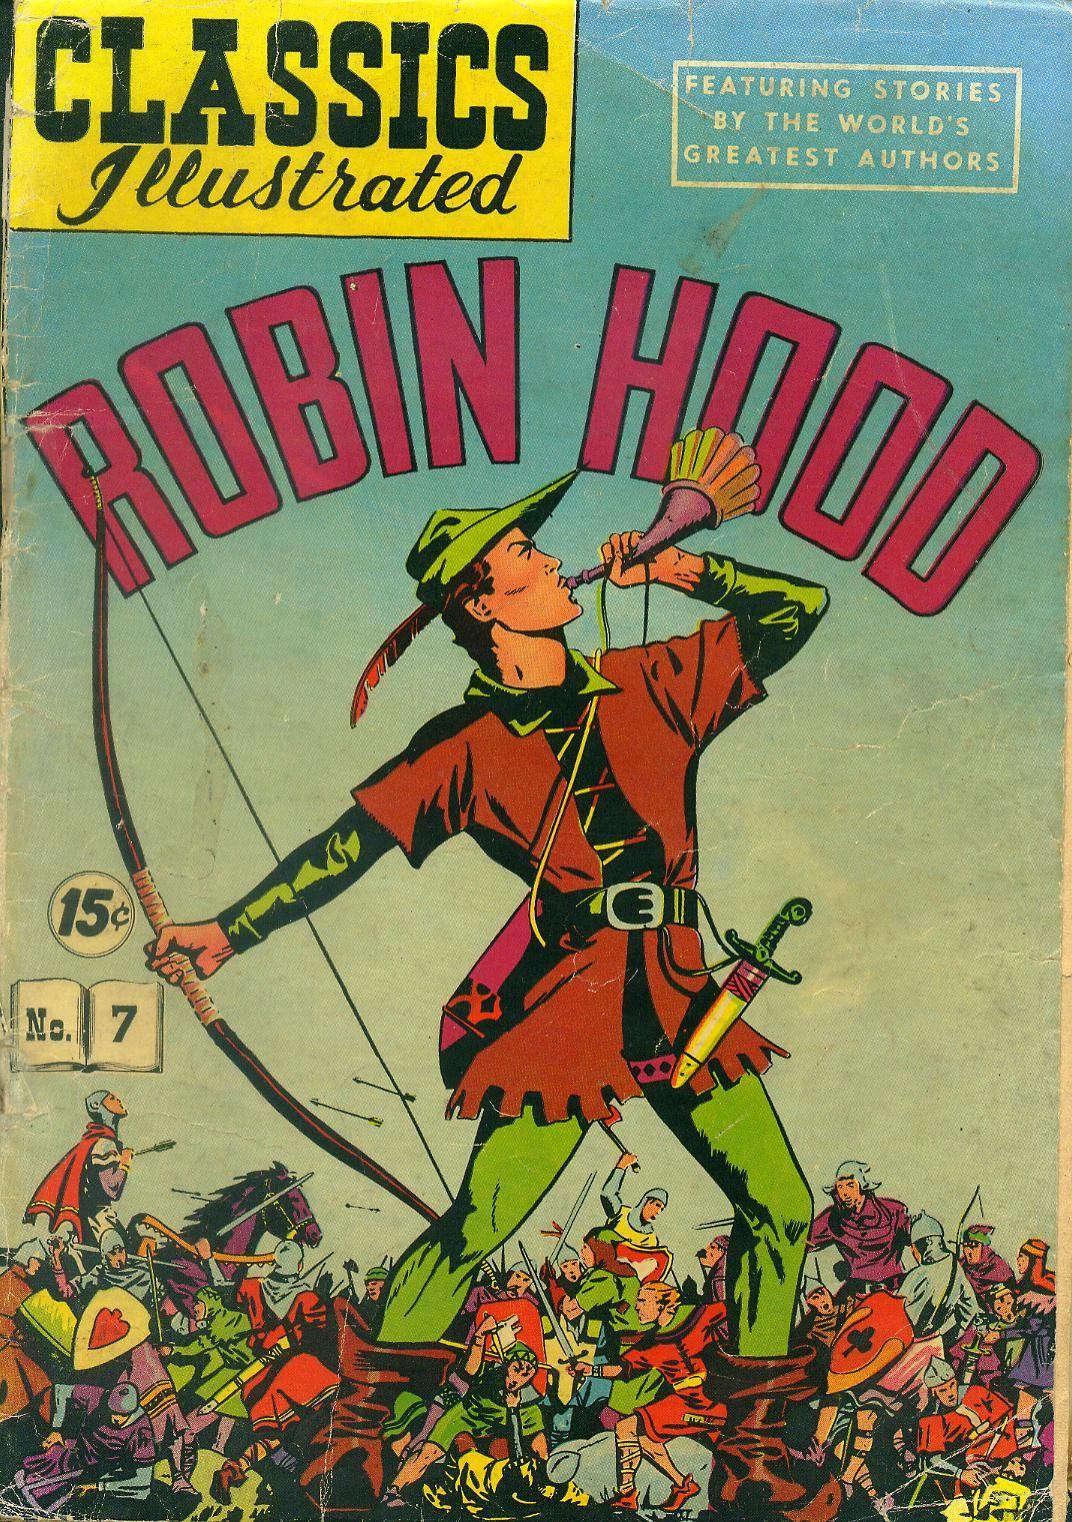 robin hood picture  classics illustrated  robin hood